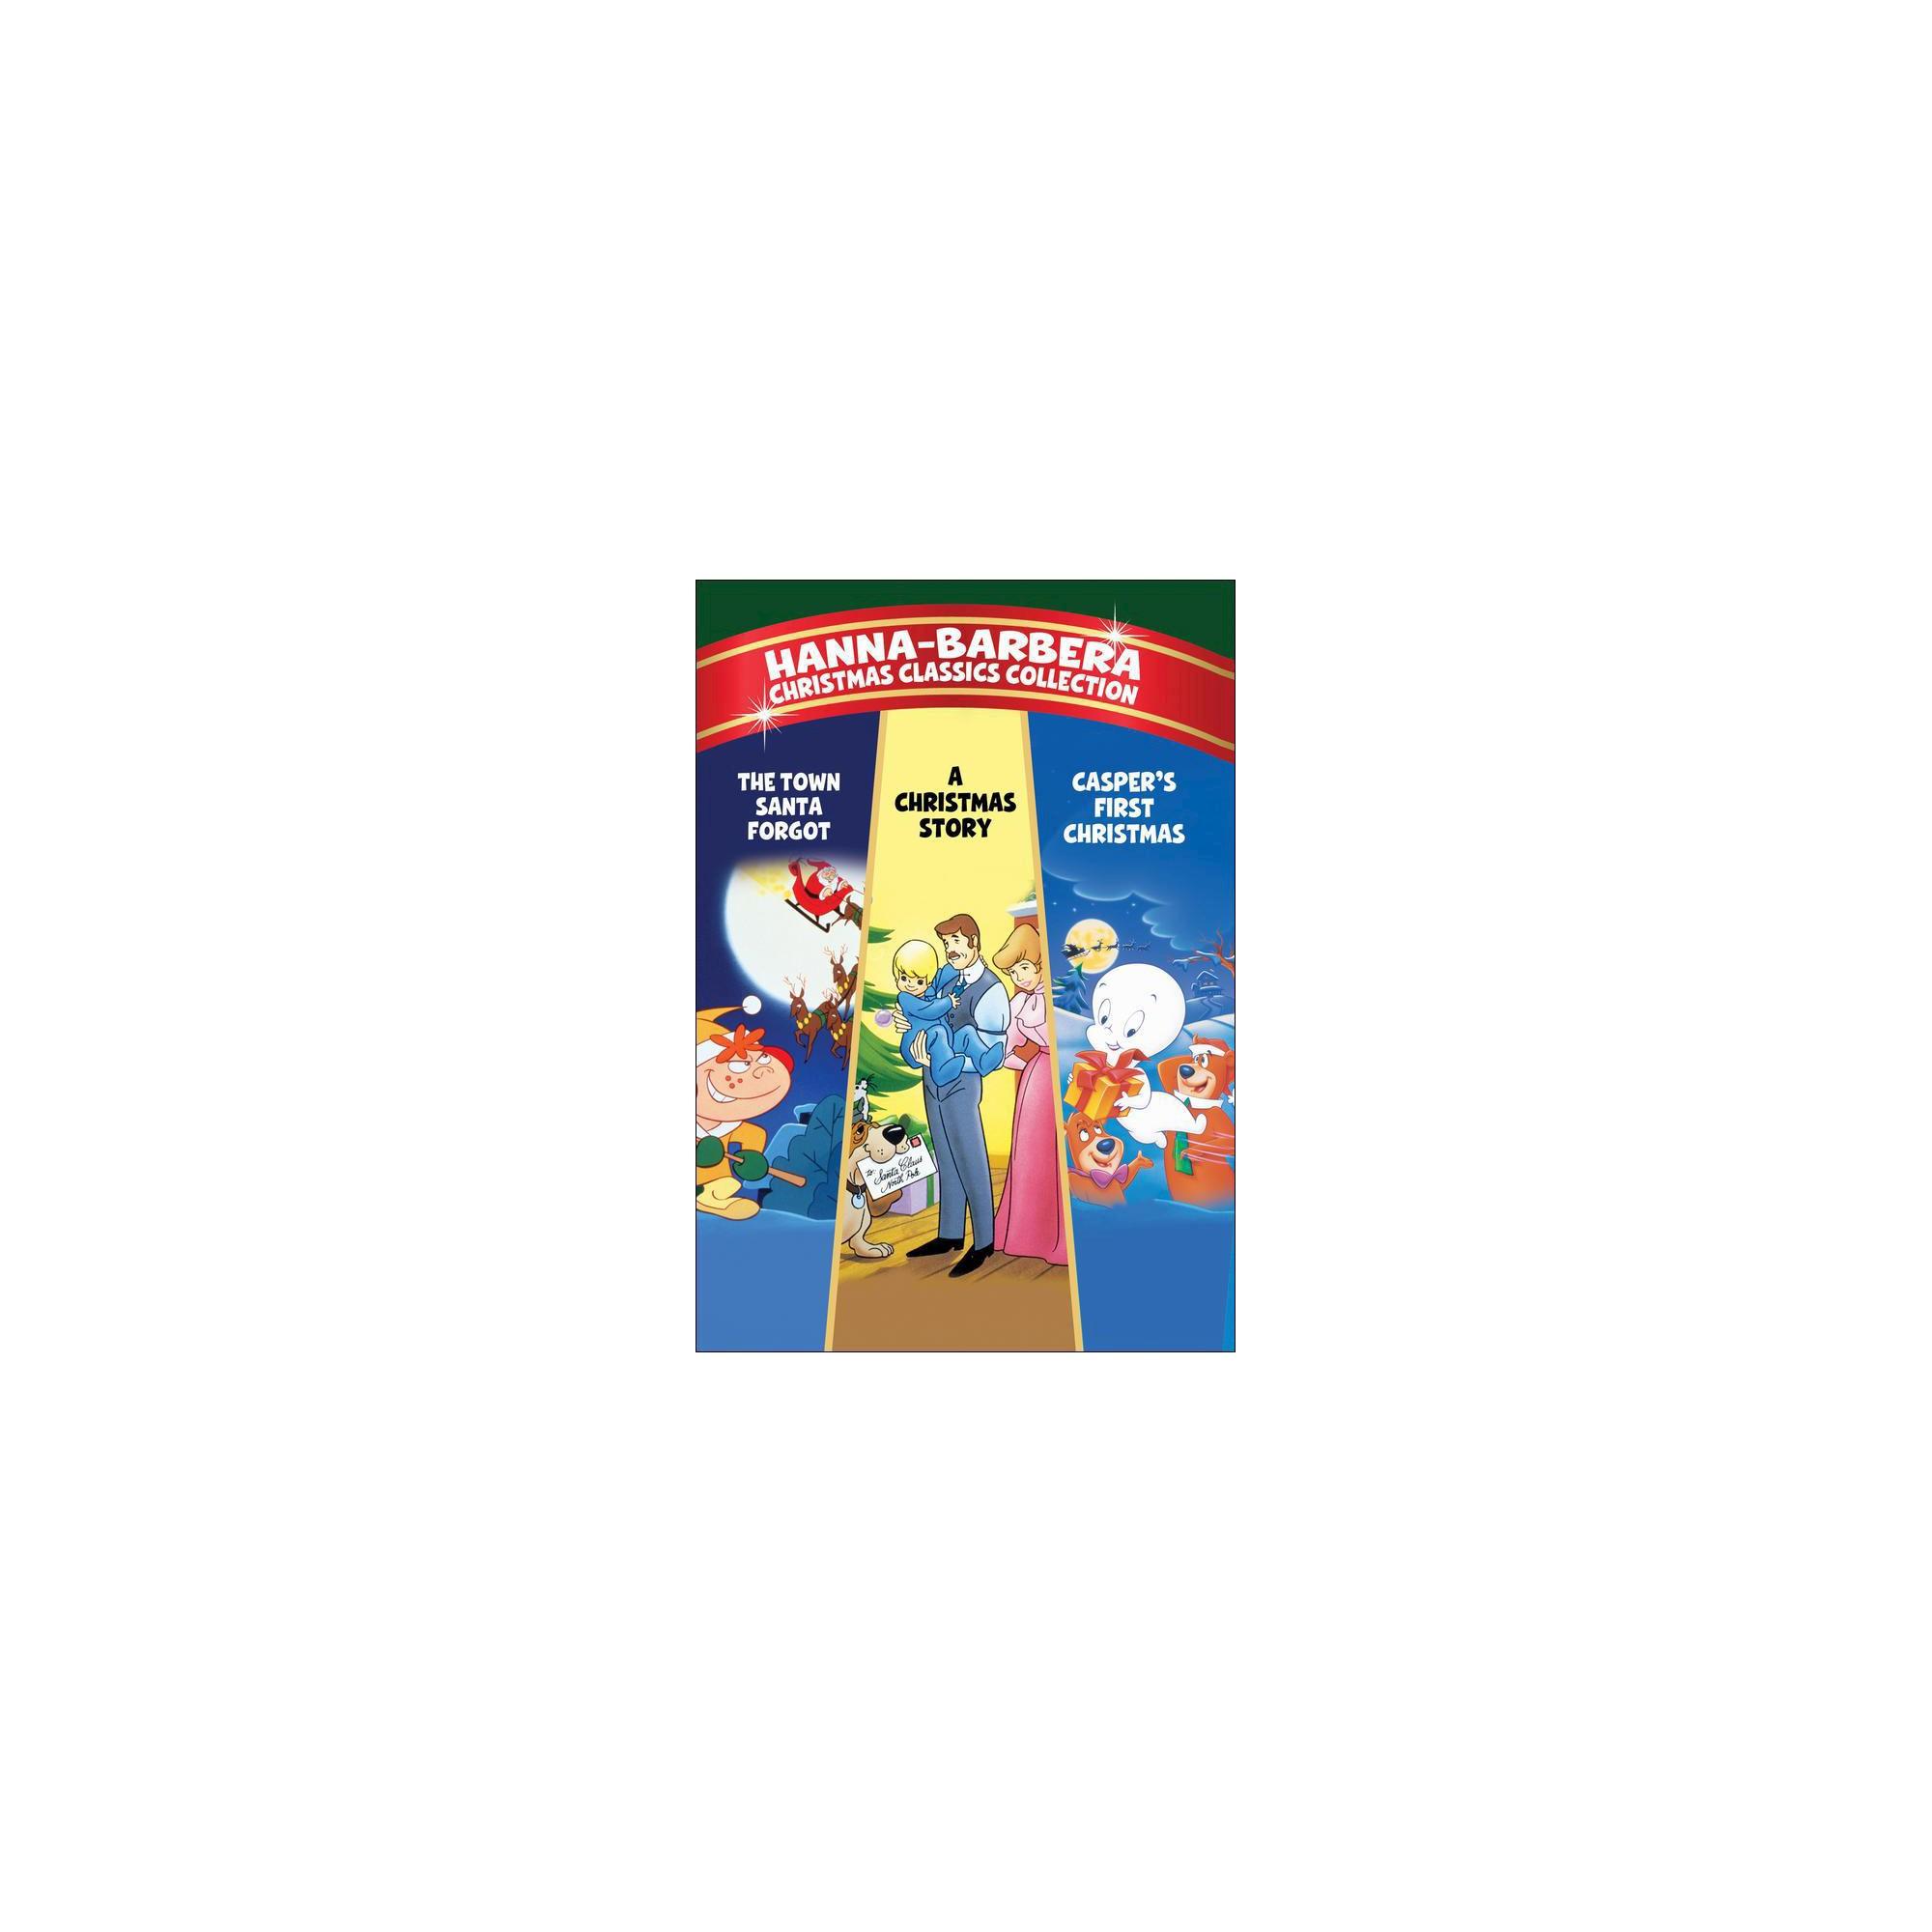 Hanna Barbera Christmas Dvd.Mod Hanna Barbera Christmas Classics 1971 93 Dvd Non